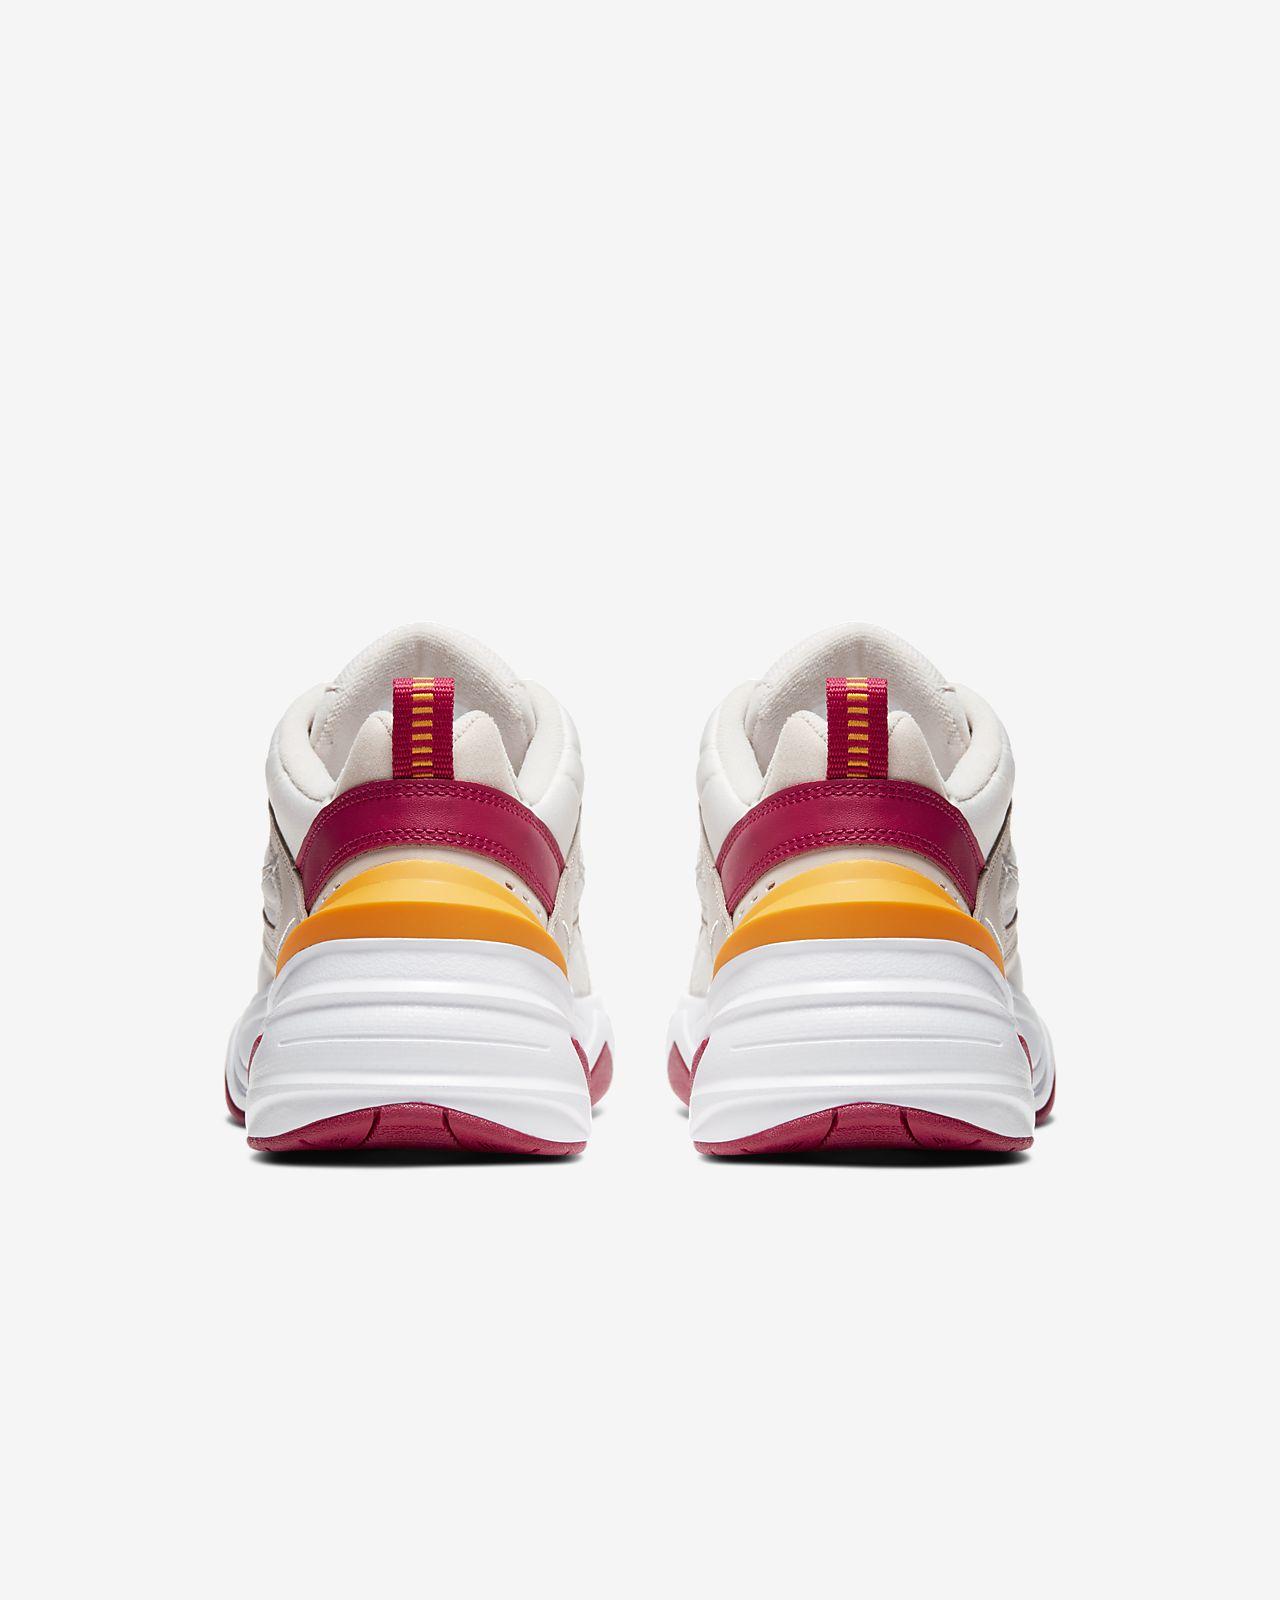 Nike Schuhe Quietschen Damen Free Orange Nike Jordan Schuhe